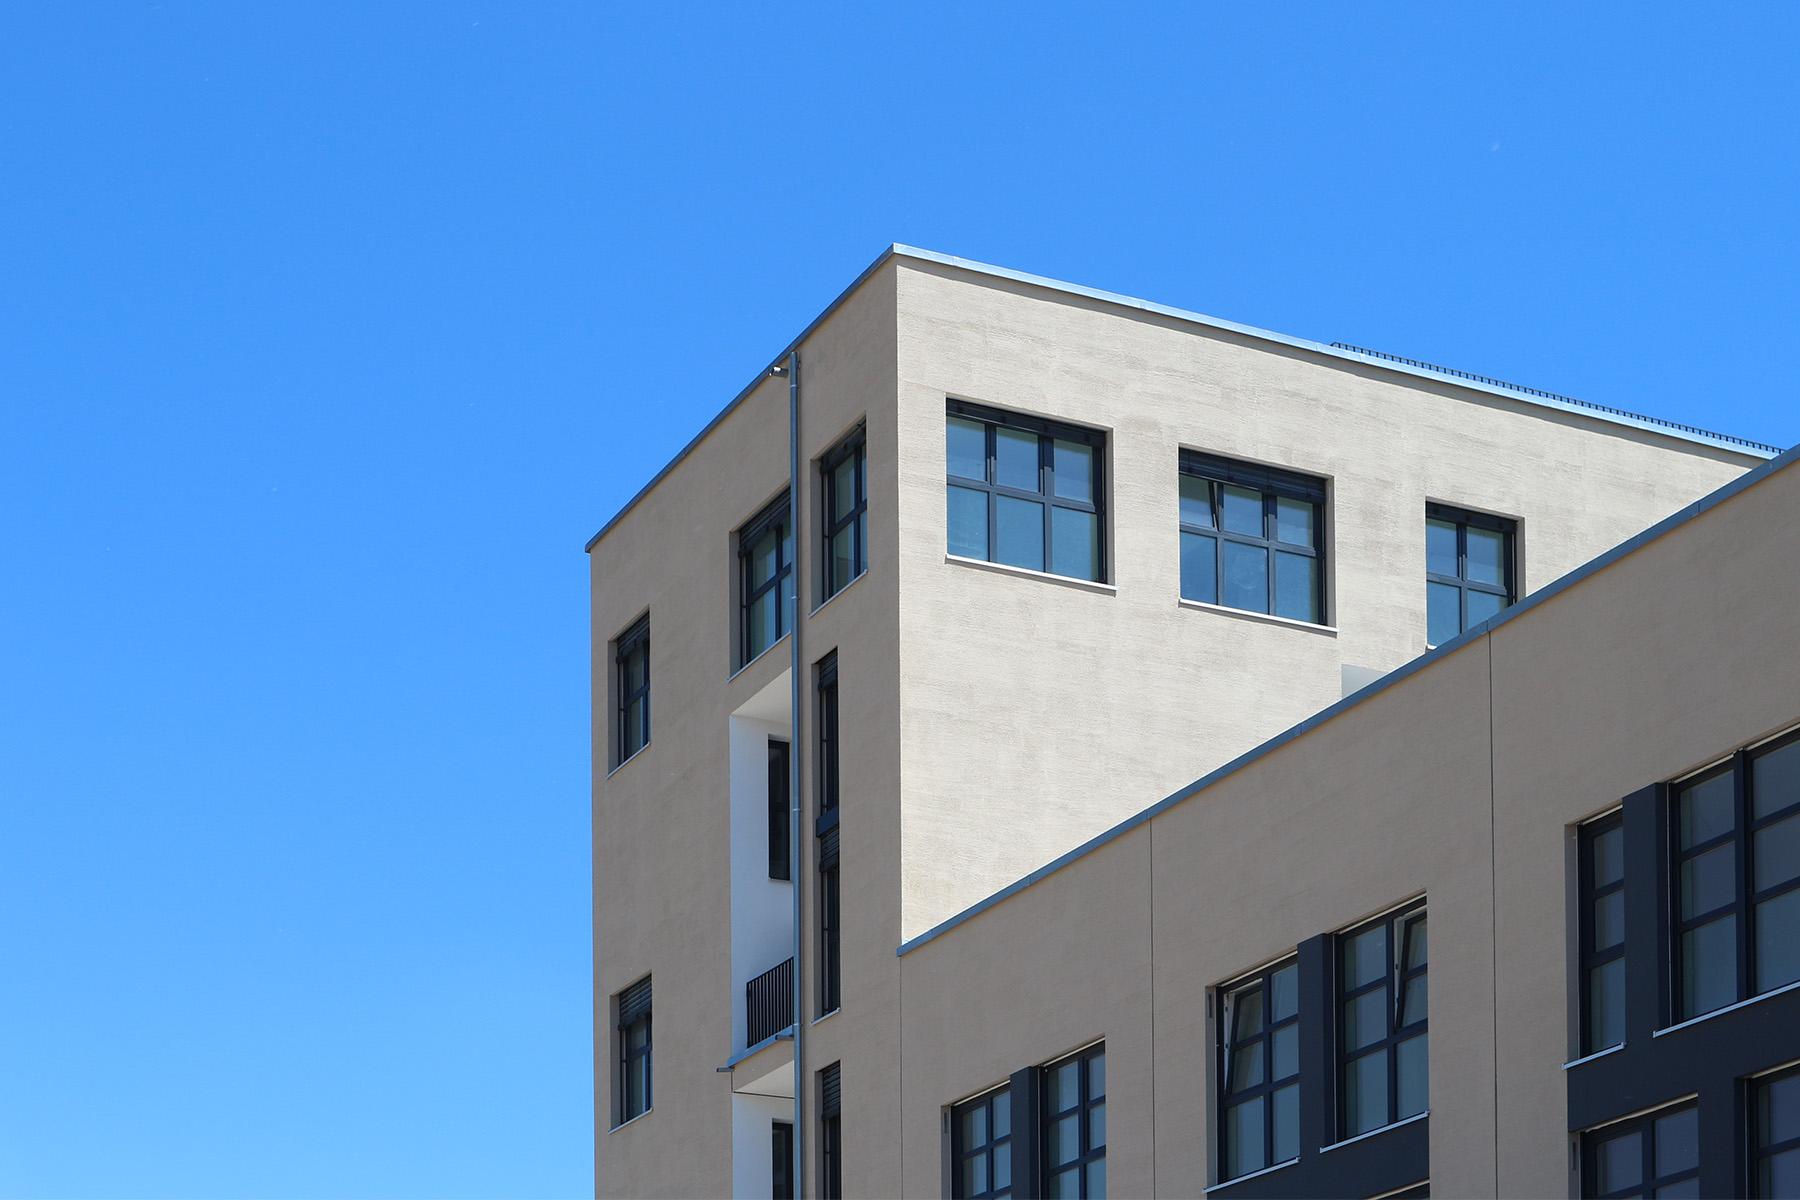 Marina Quartier.  Industriecharme